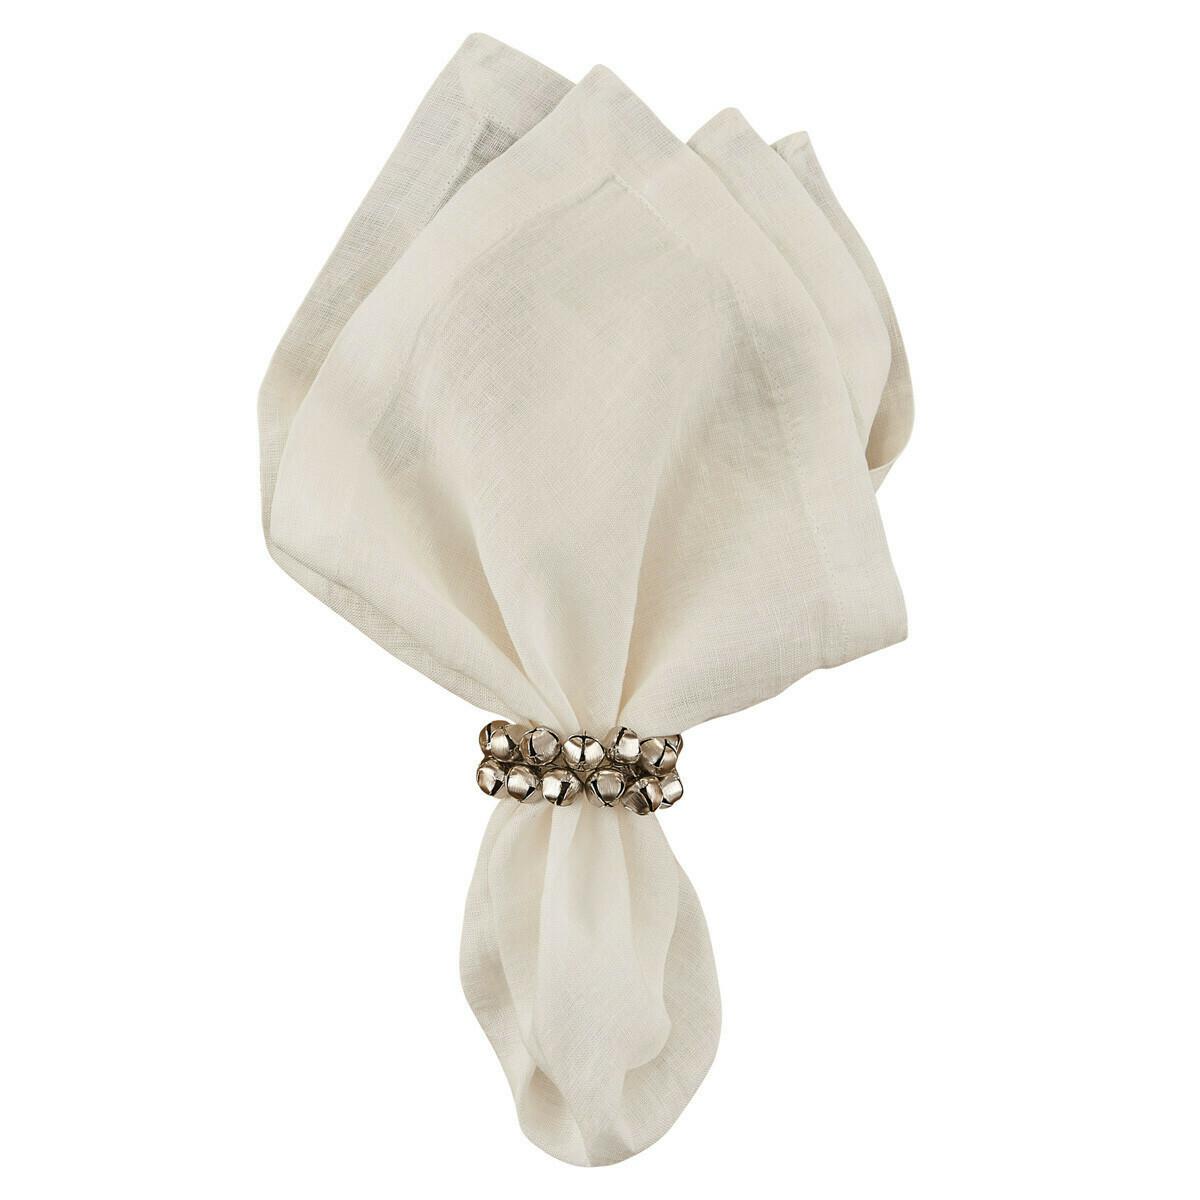 Silver Jingle Bell Napkin Ring